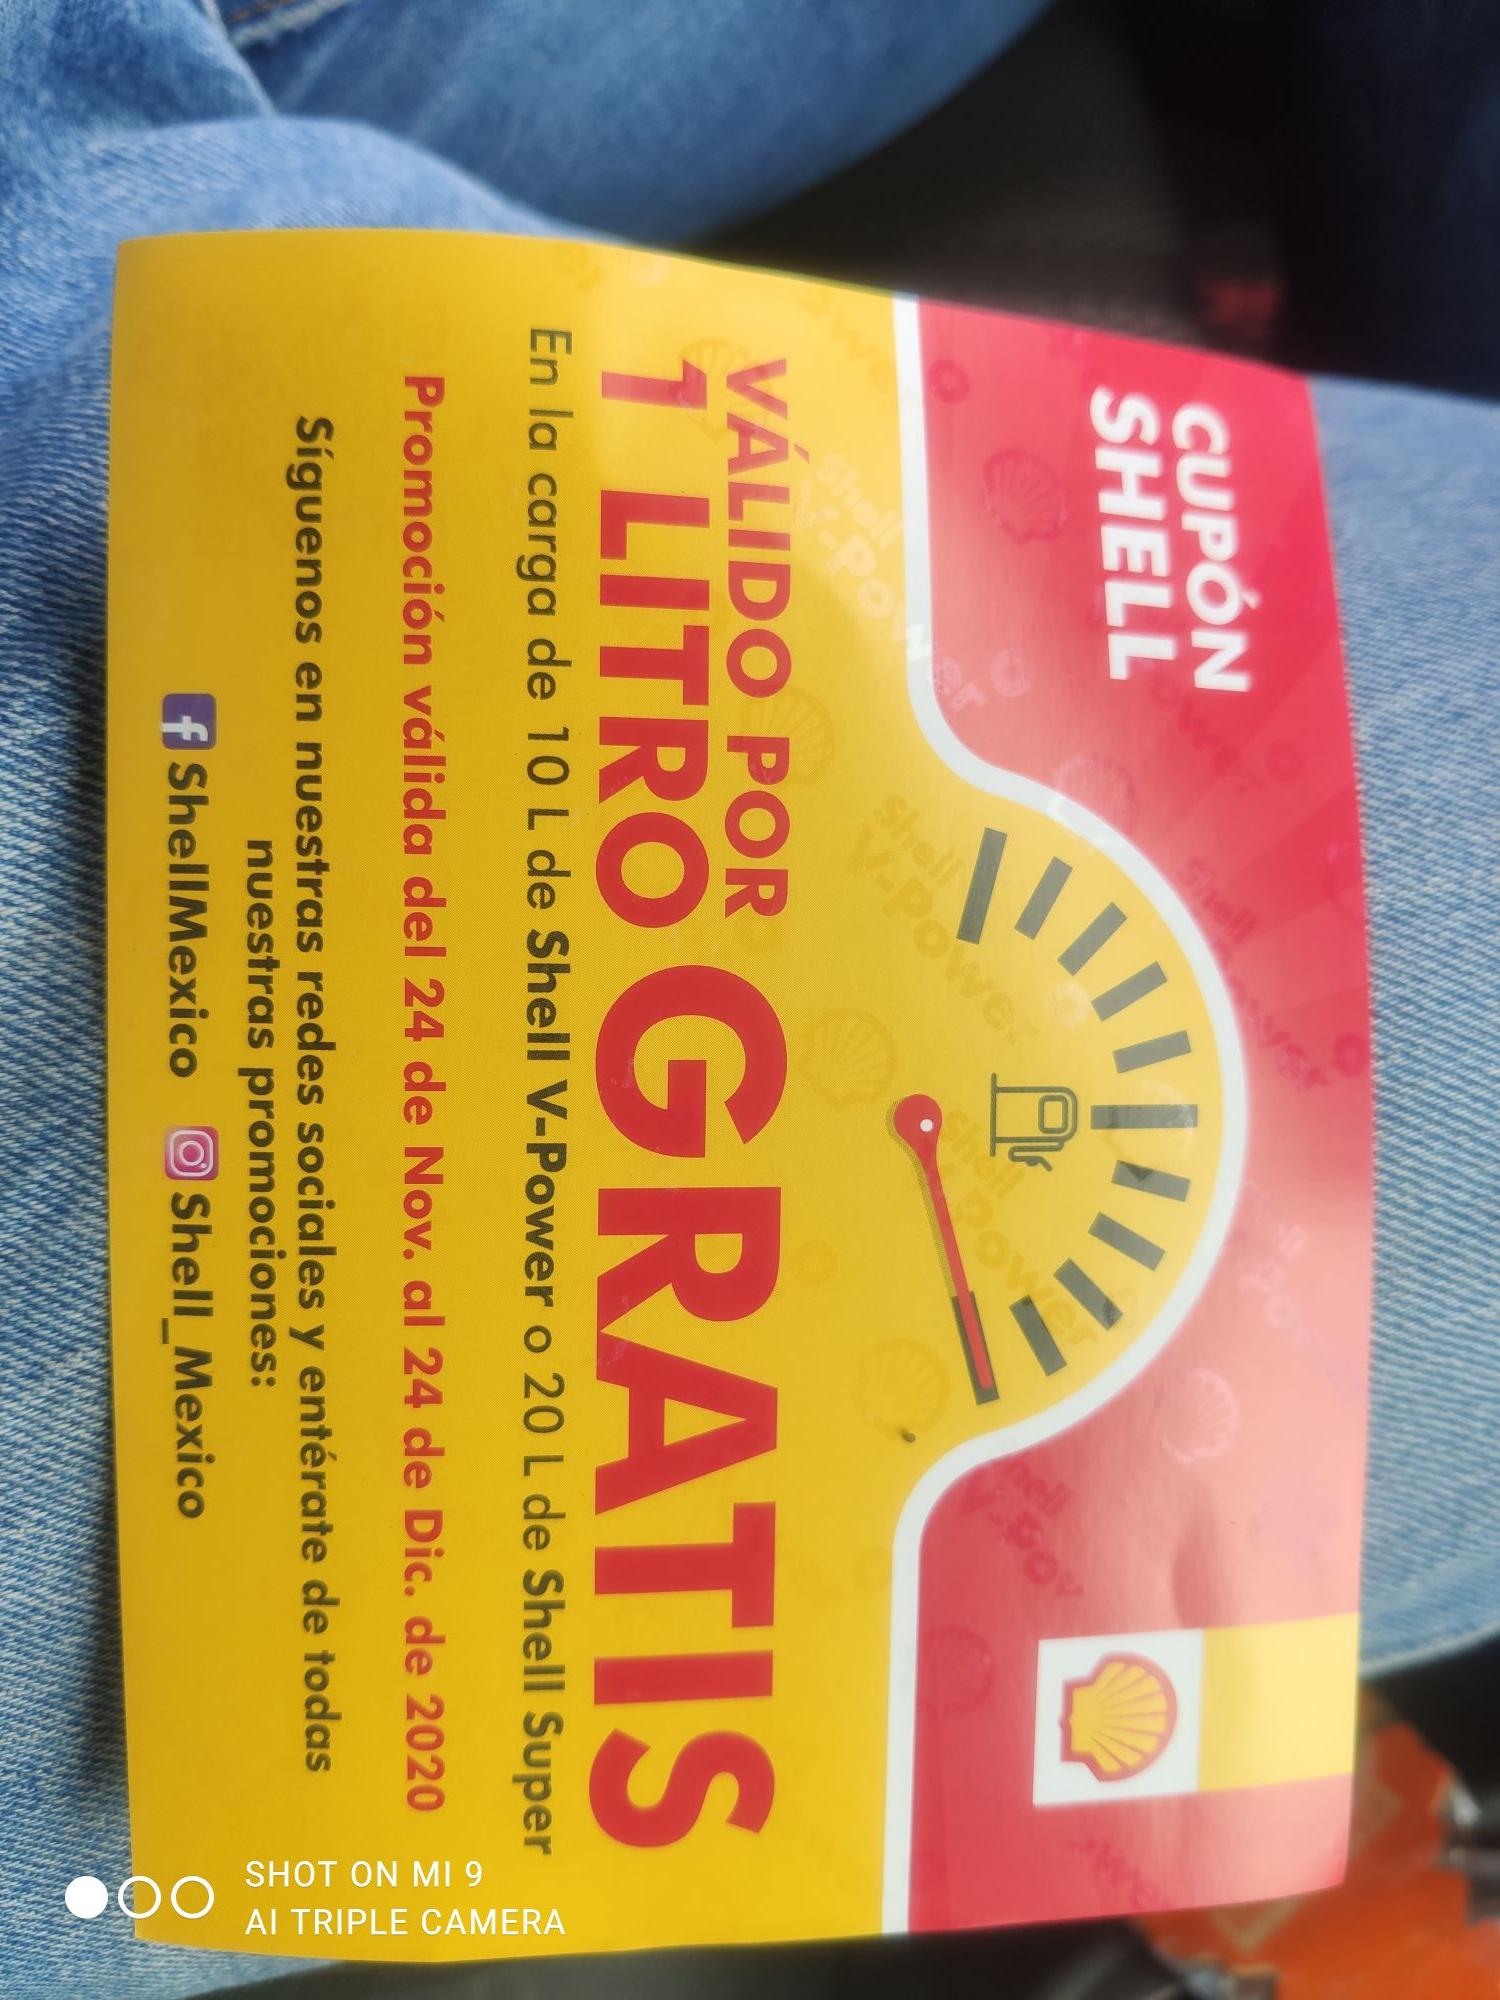 Gasolineras Shell: 1 lt al cargar 10 lt me dieron el cupón en Universidad esquina Av. Popocatepetl CDMX